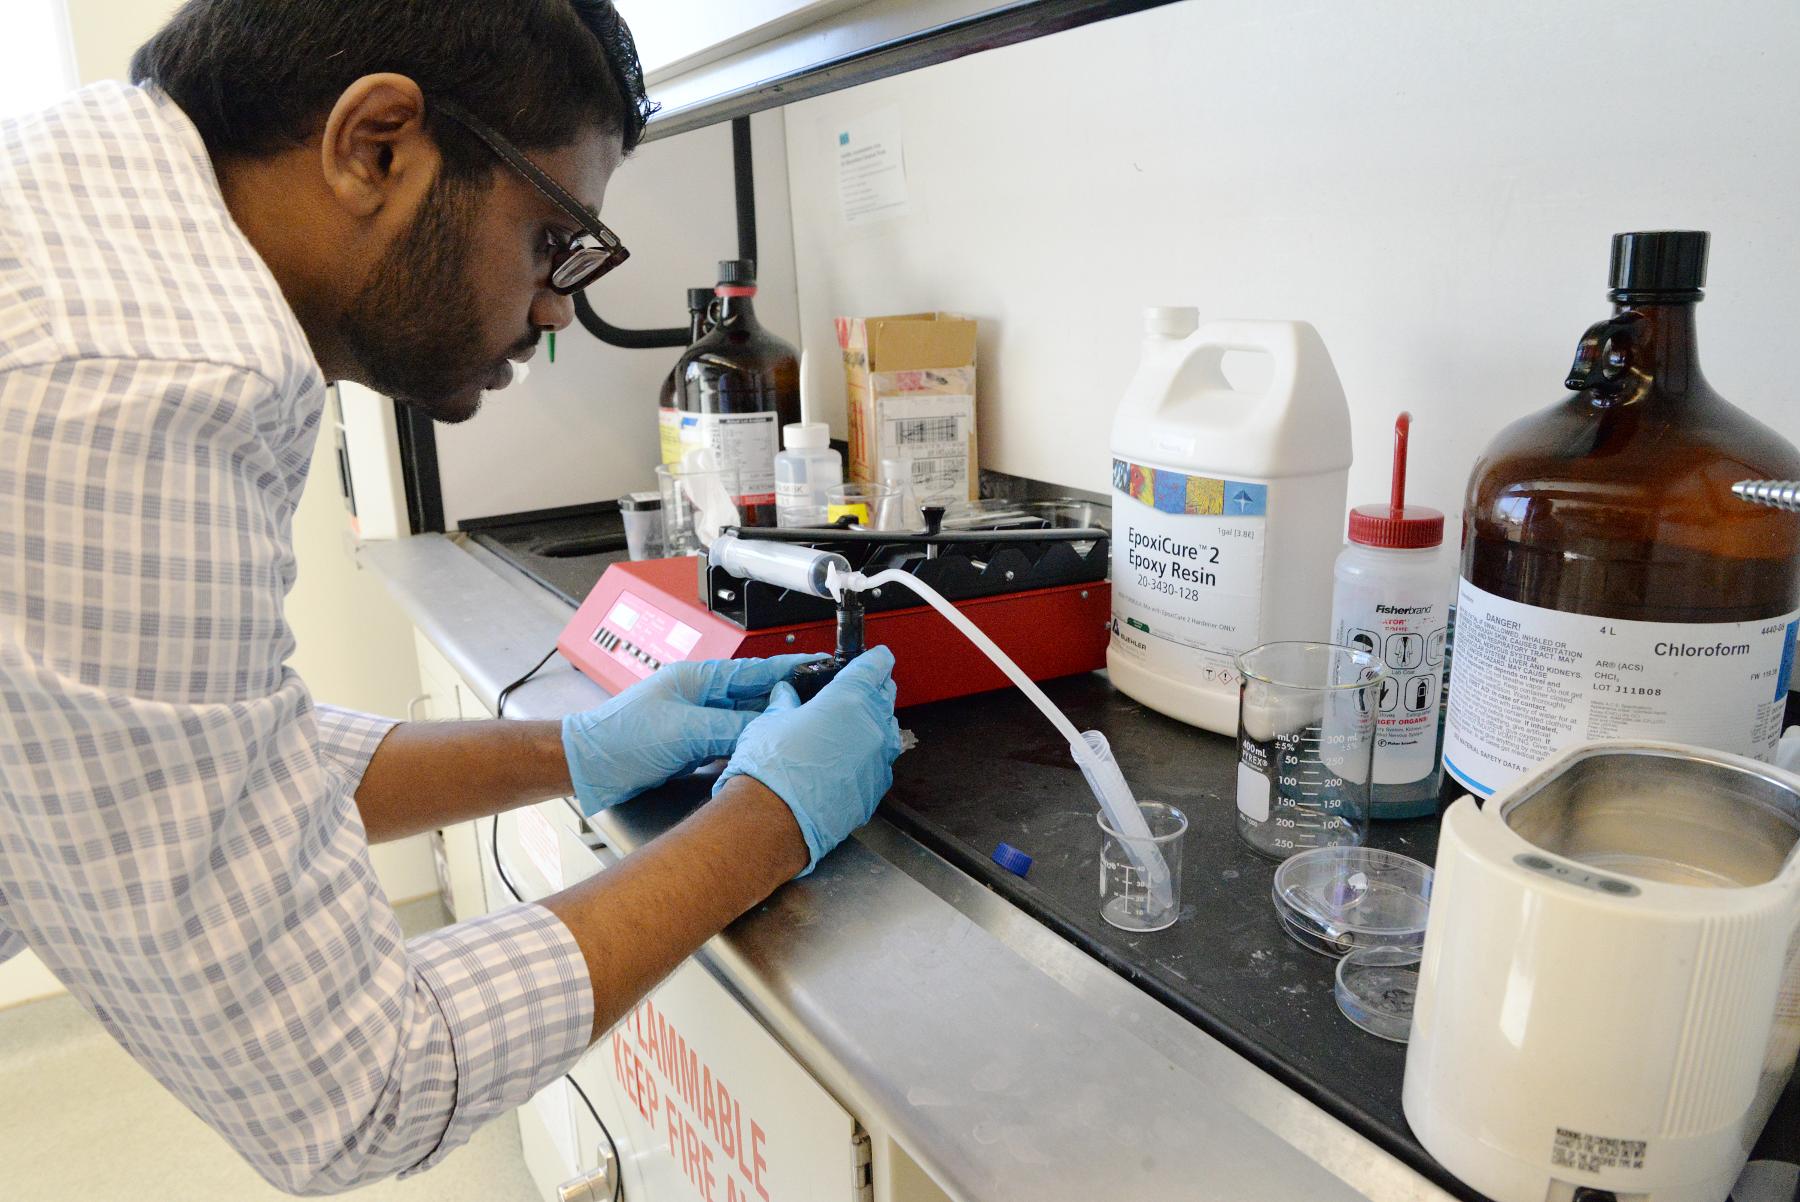 Interdisciplinary research team studies whether using e